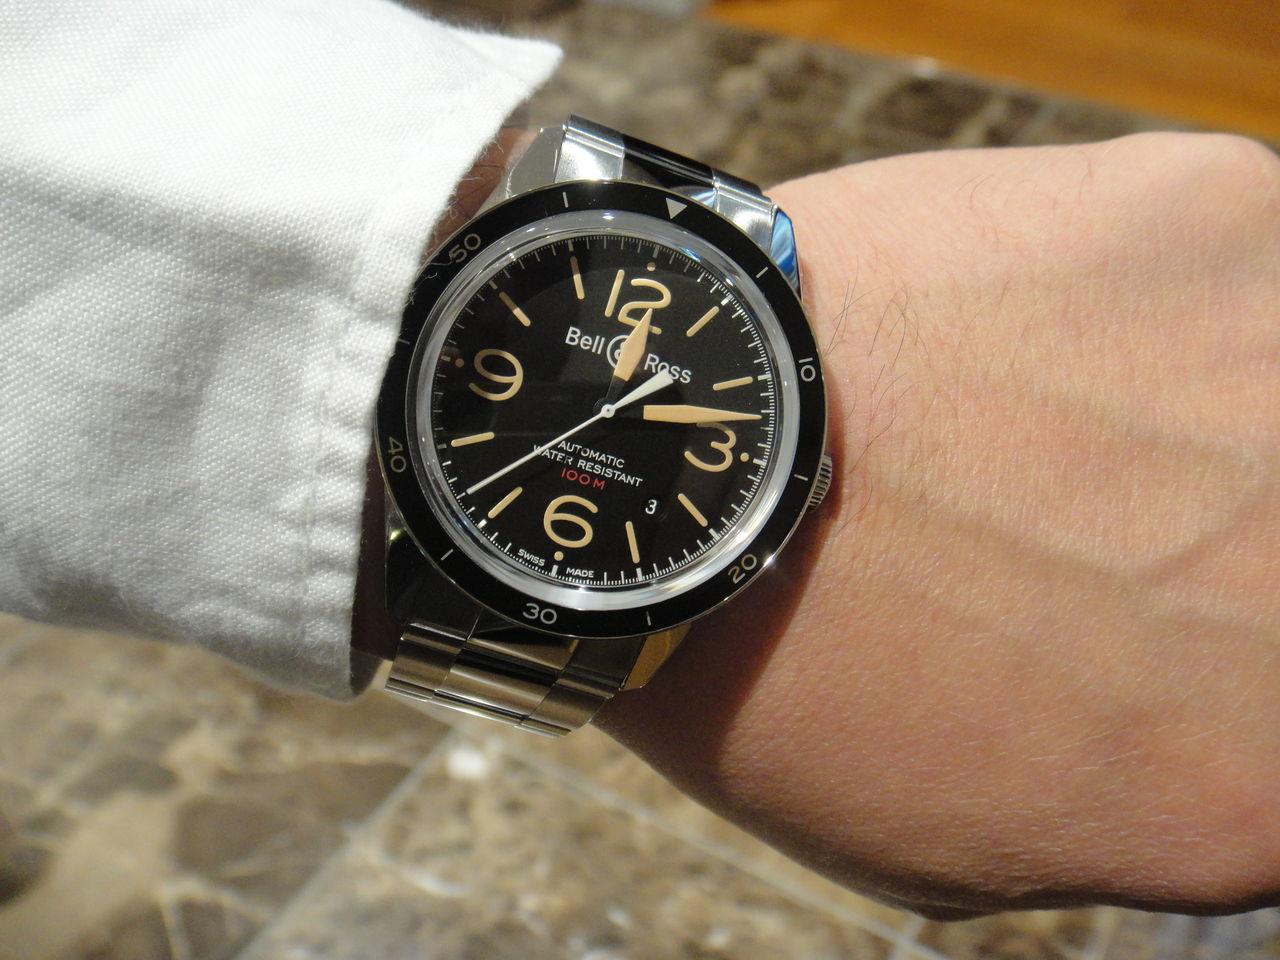 reputable site 26f3b 2ea04 HF-AGE京都店素敵な時計のブログ:S様の元へ2013新作 ...